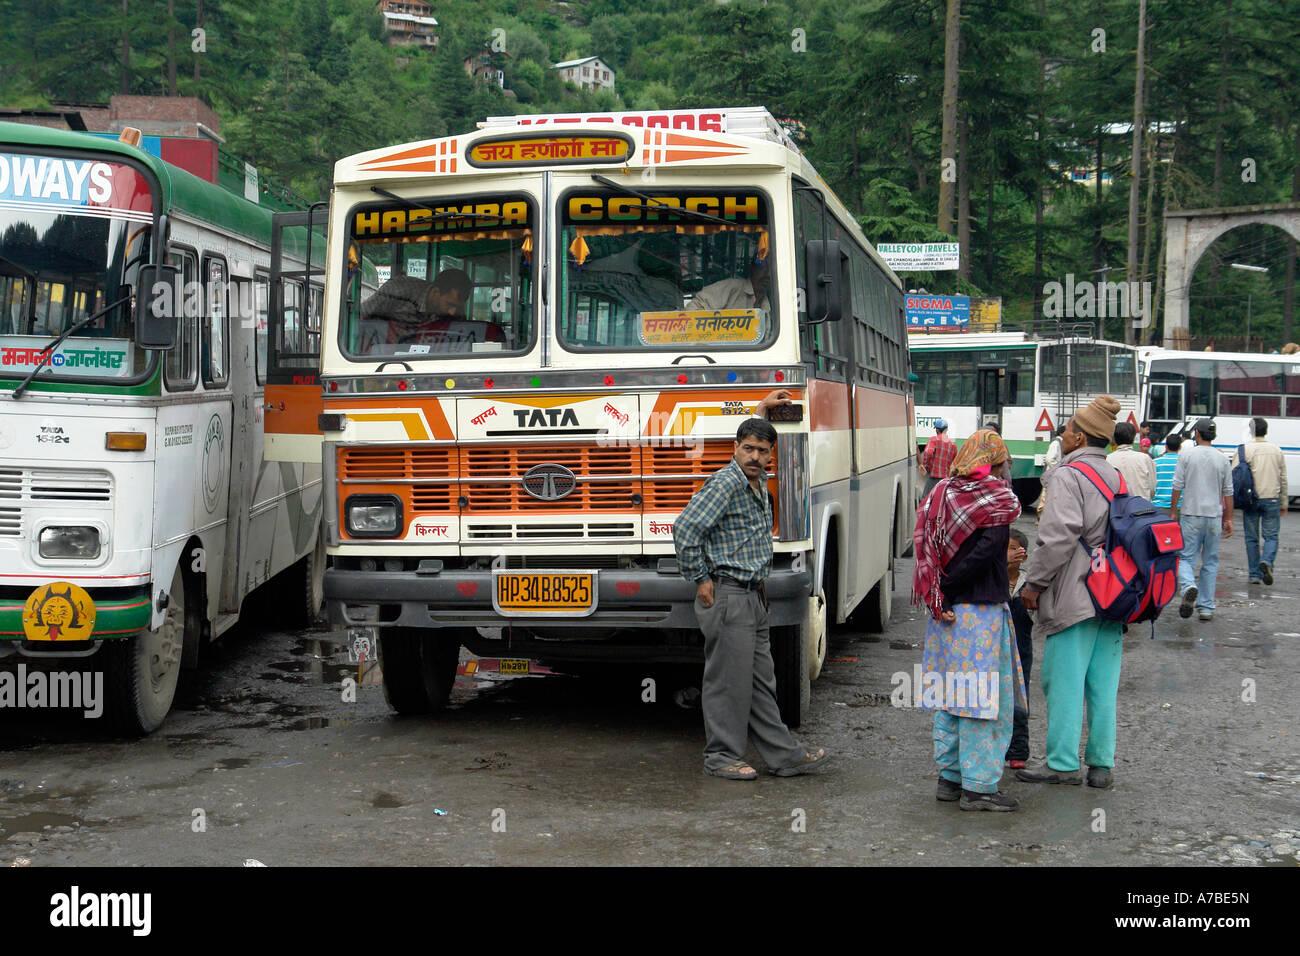 at manali bus station - Stock Image